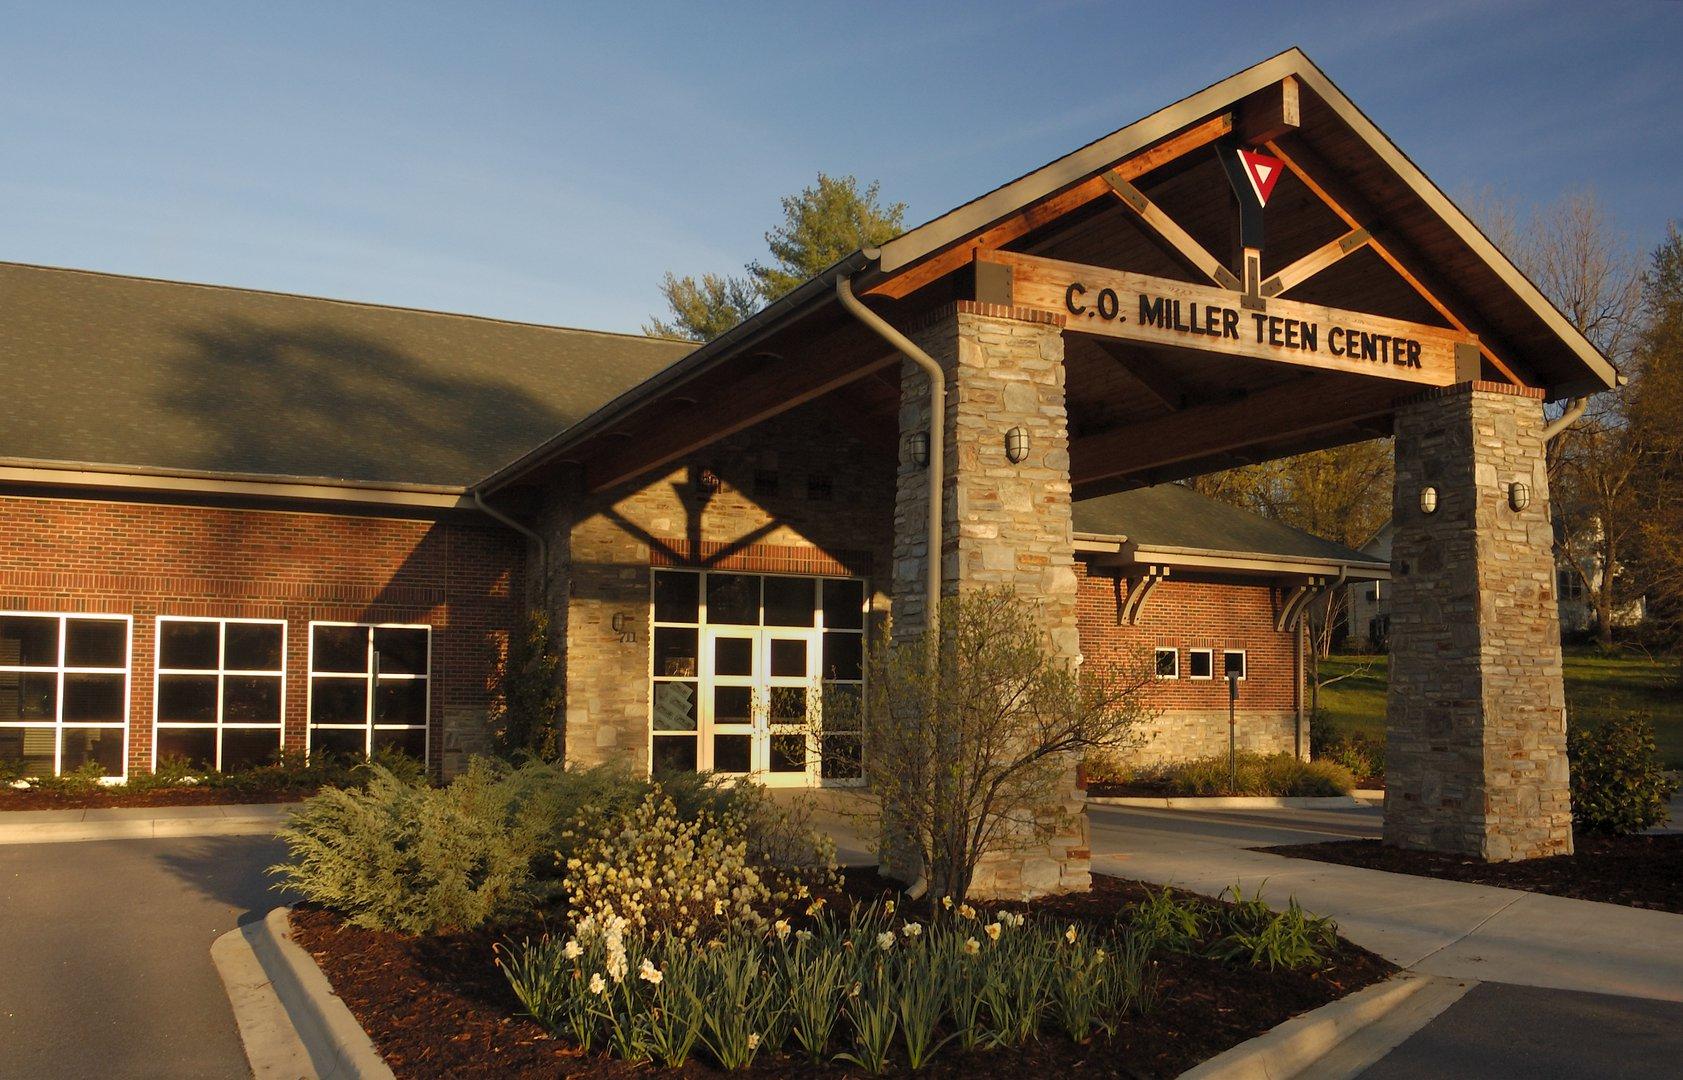 YMCA Hickory Teen Center